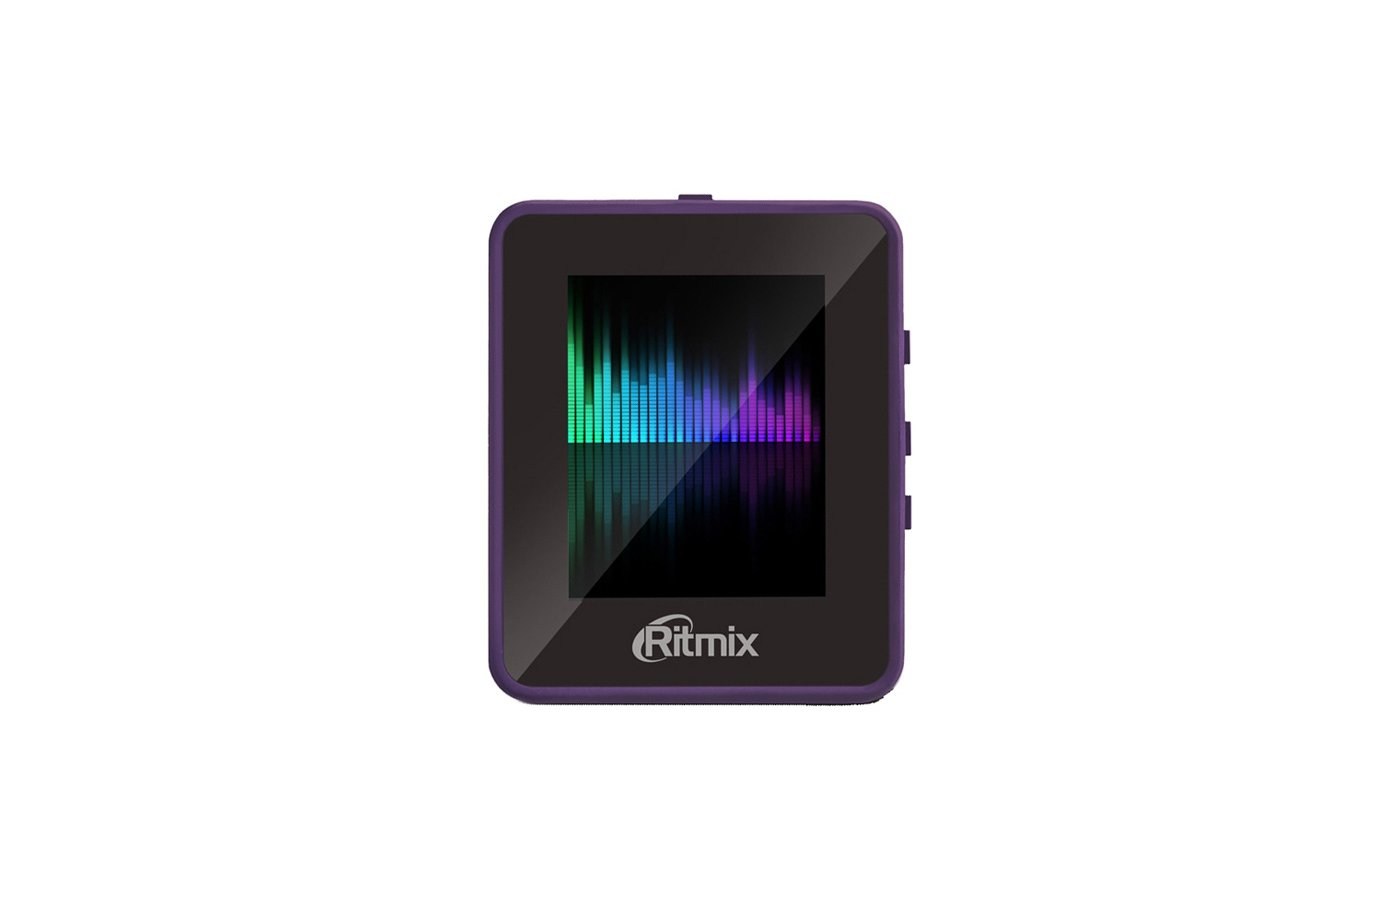 МР3 плеер Ritmix RF-4150 4Gb фиолетовый